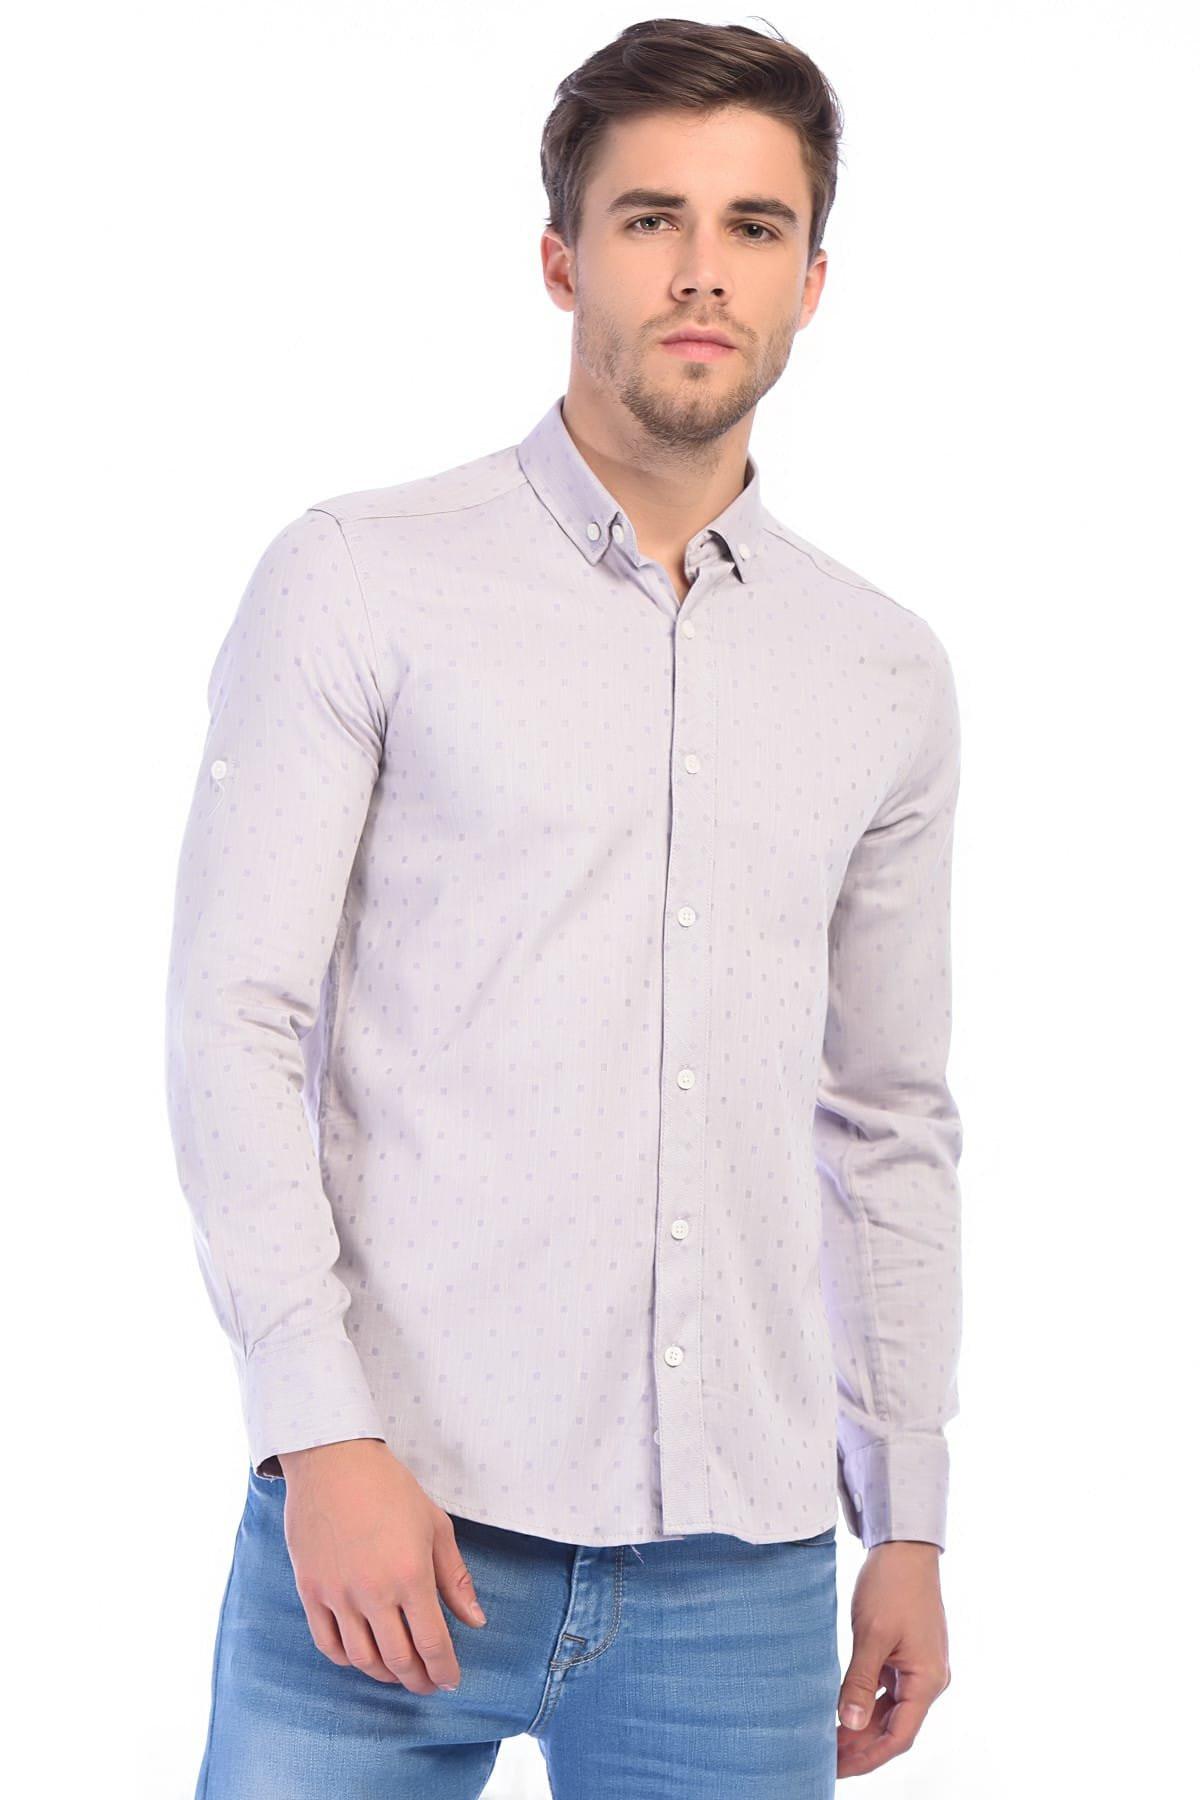 14735c4a91109 Erkek Gömlek Modelleri   Manche ®   Şık, Modern Ve Rahat✓